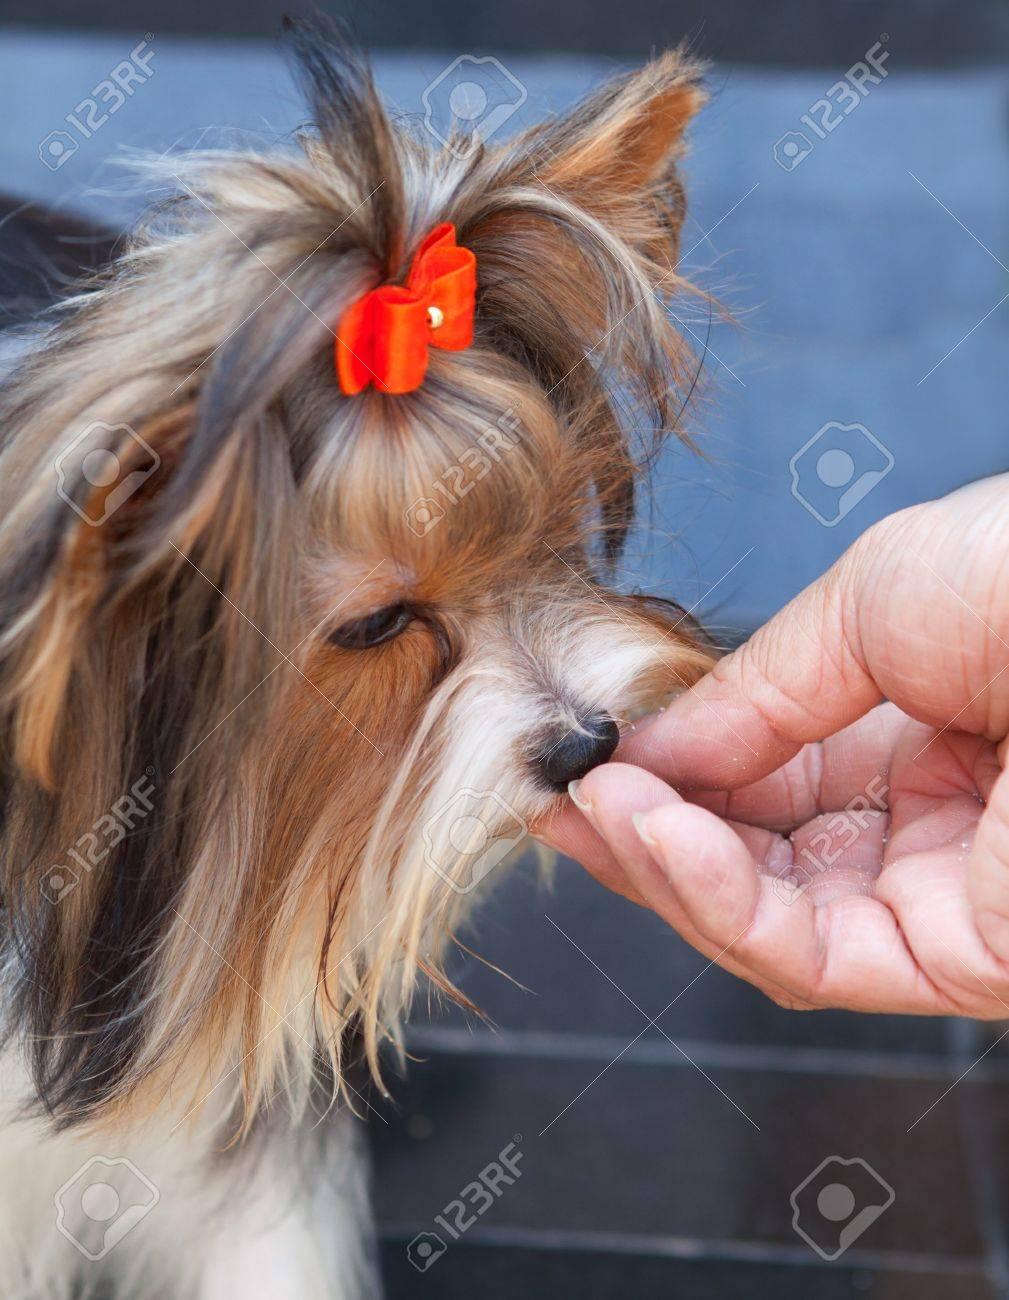 hand feeding food to pet dog Stock Photo - 14605420